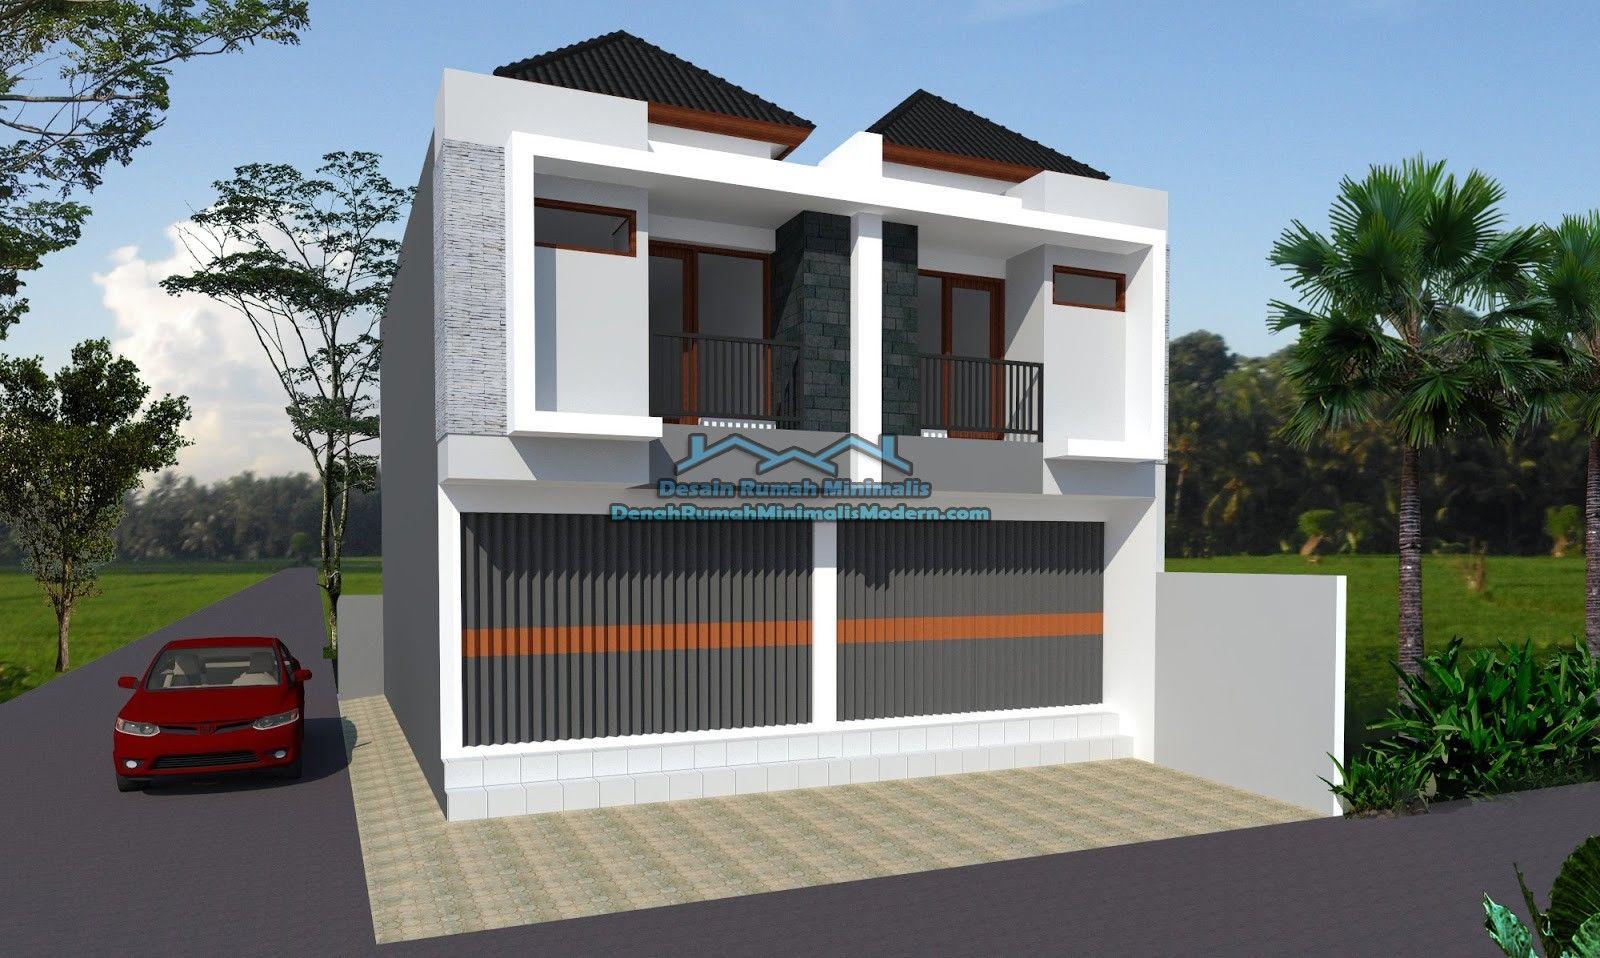 Desain Toko Minimalis Tampak Depan Cek Bahan Bangunan